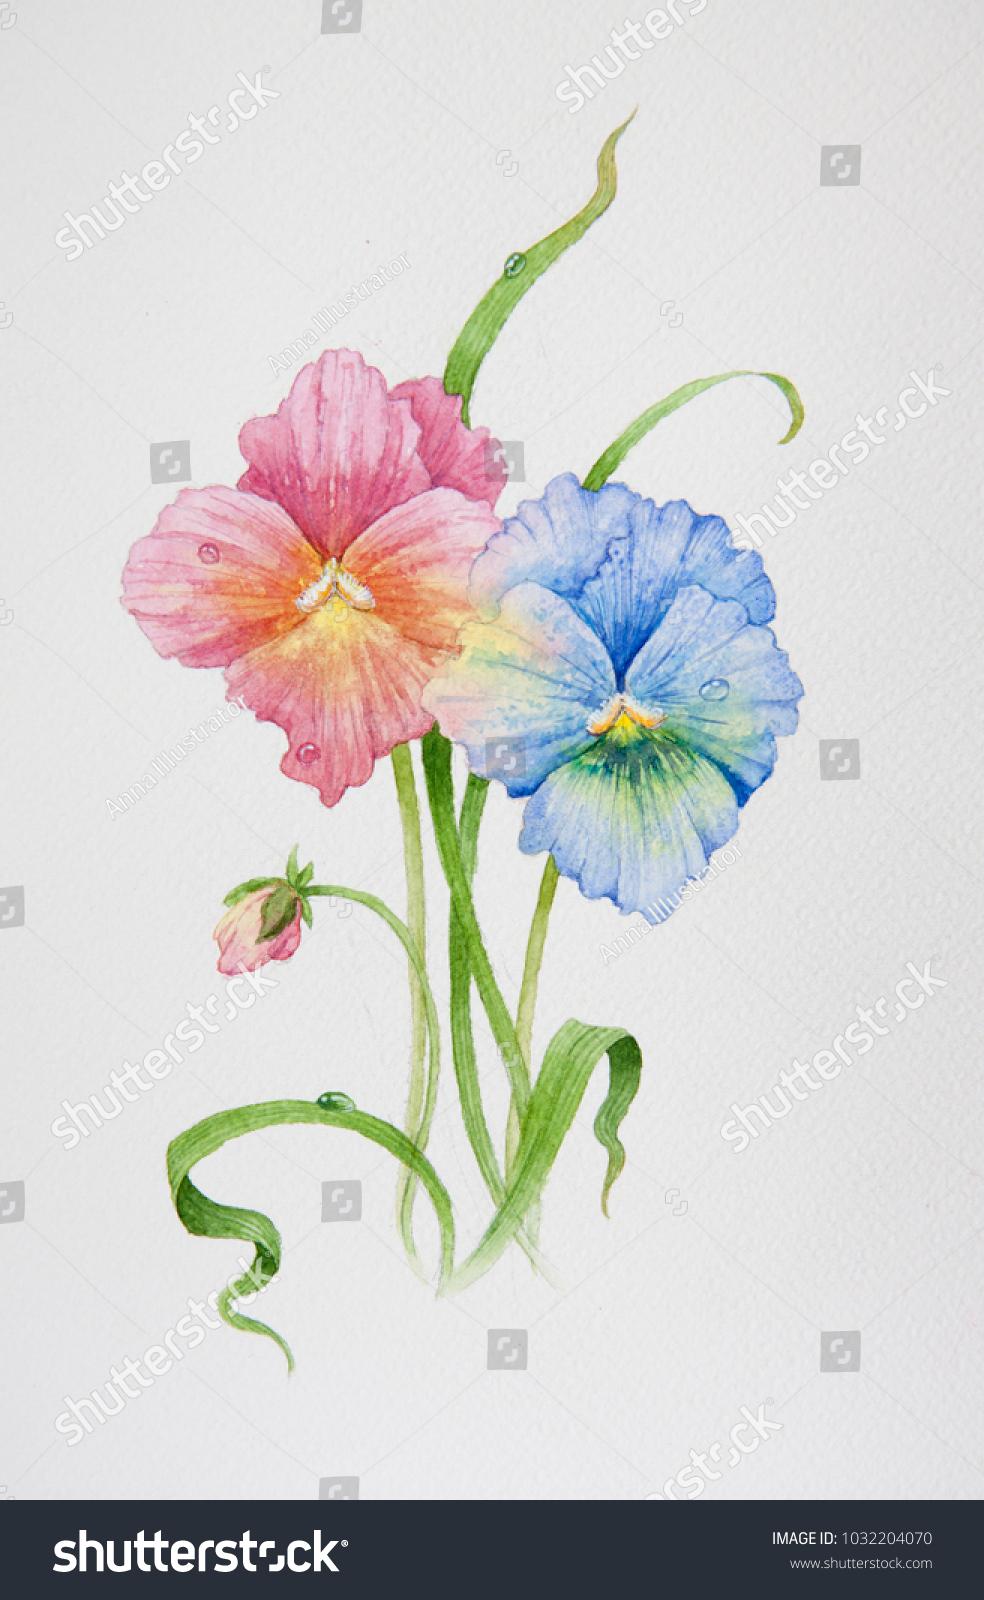 Spring Summer Flowers Pansies Leaves Irises Stock Illustration